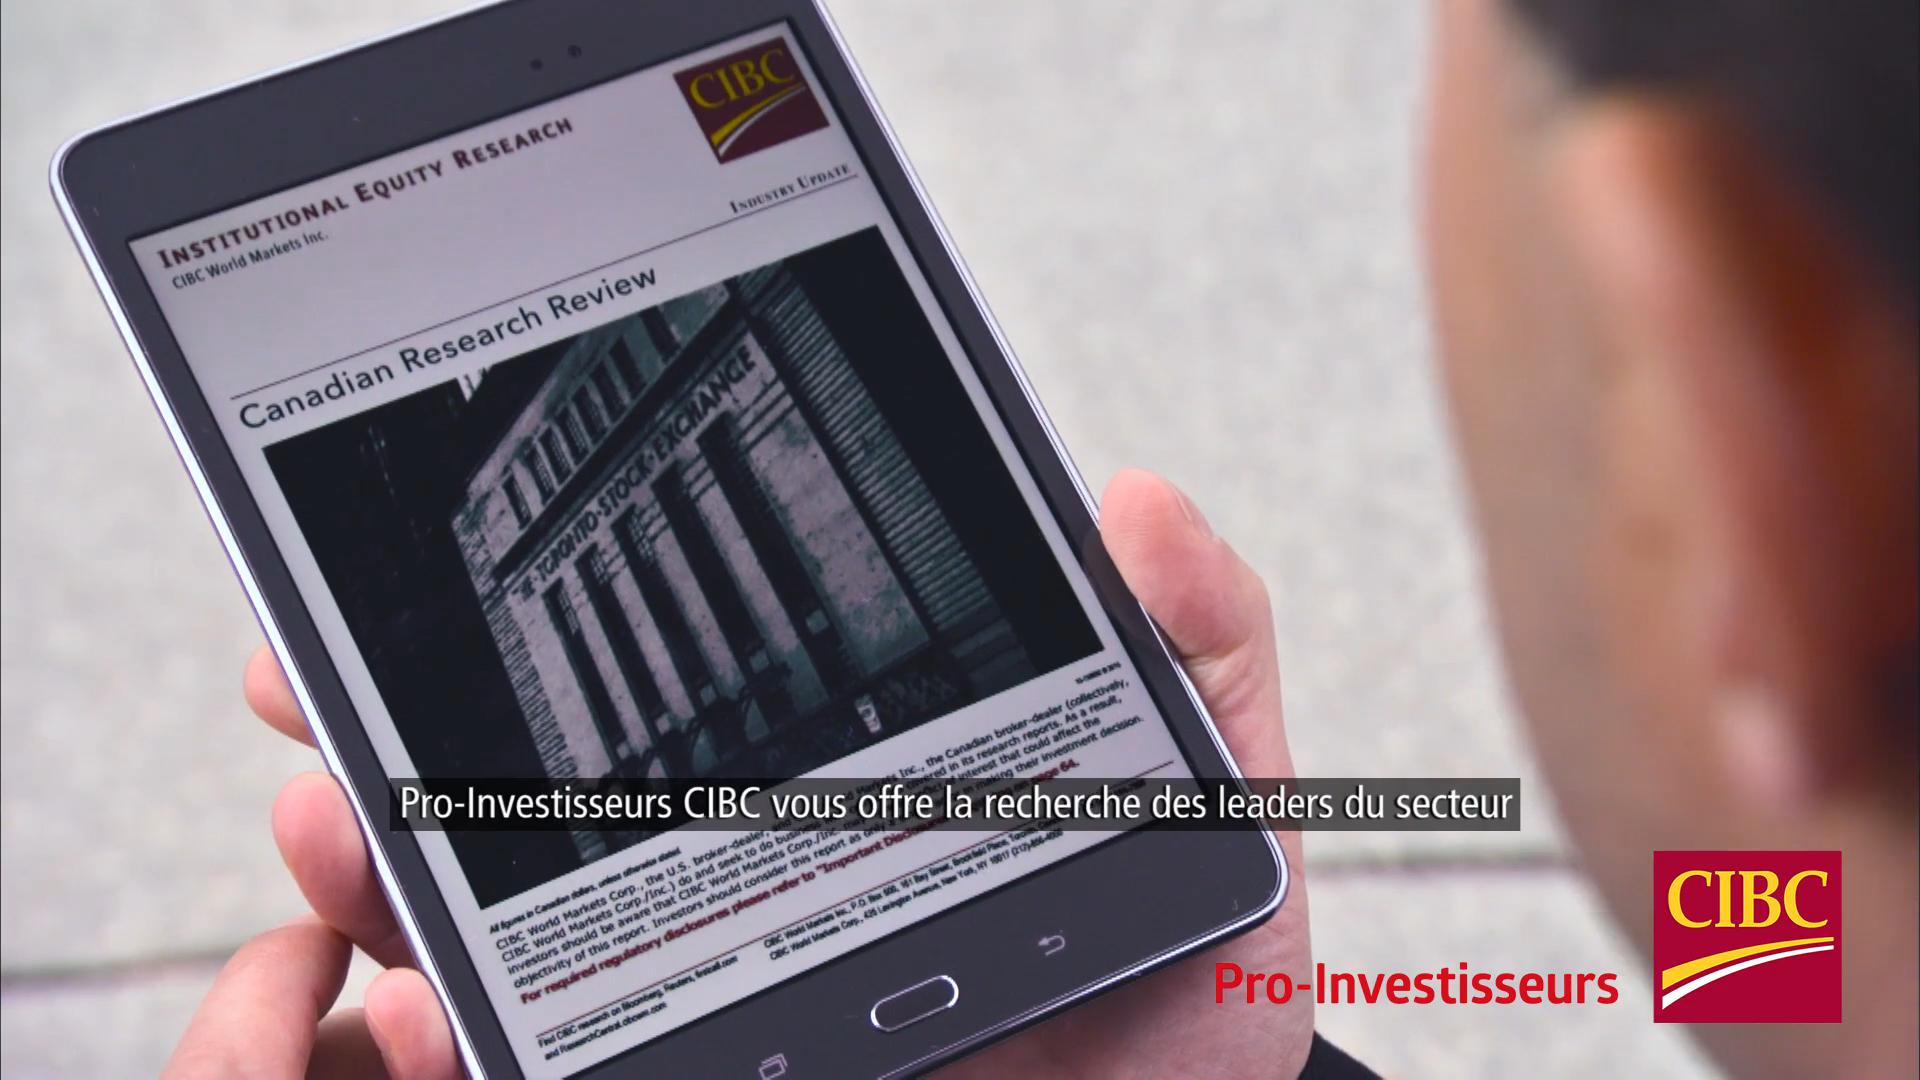 20931_FR_CIBC_Investors Edge_Episode 1 - Research_FINAL_Video ID-21092